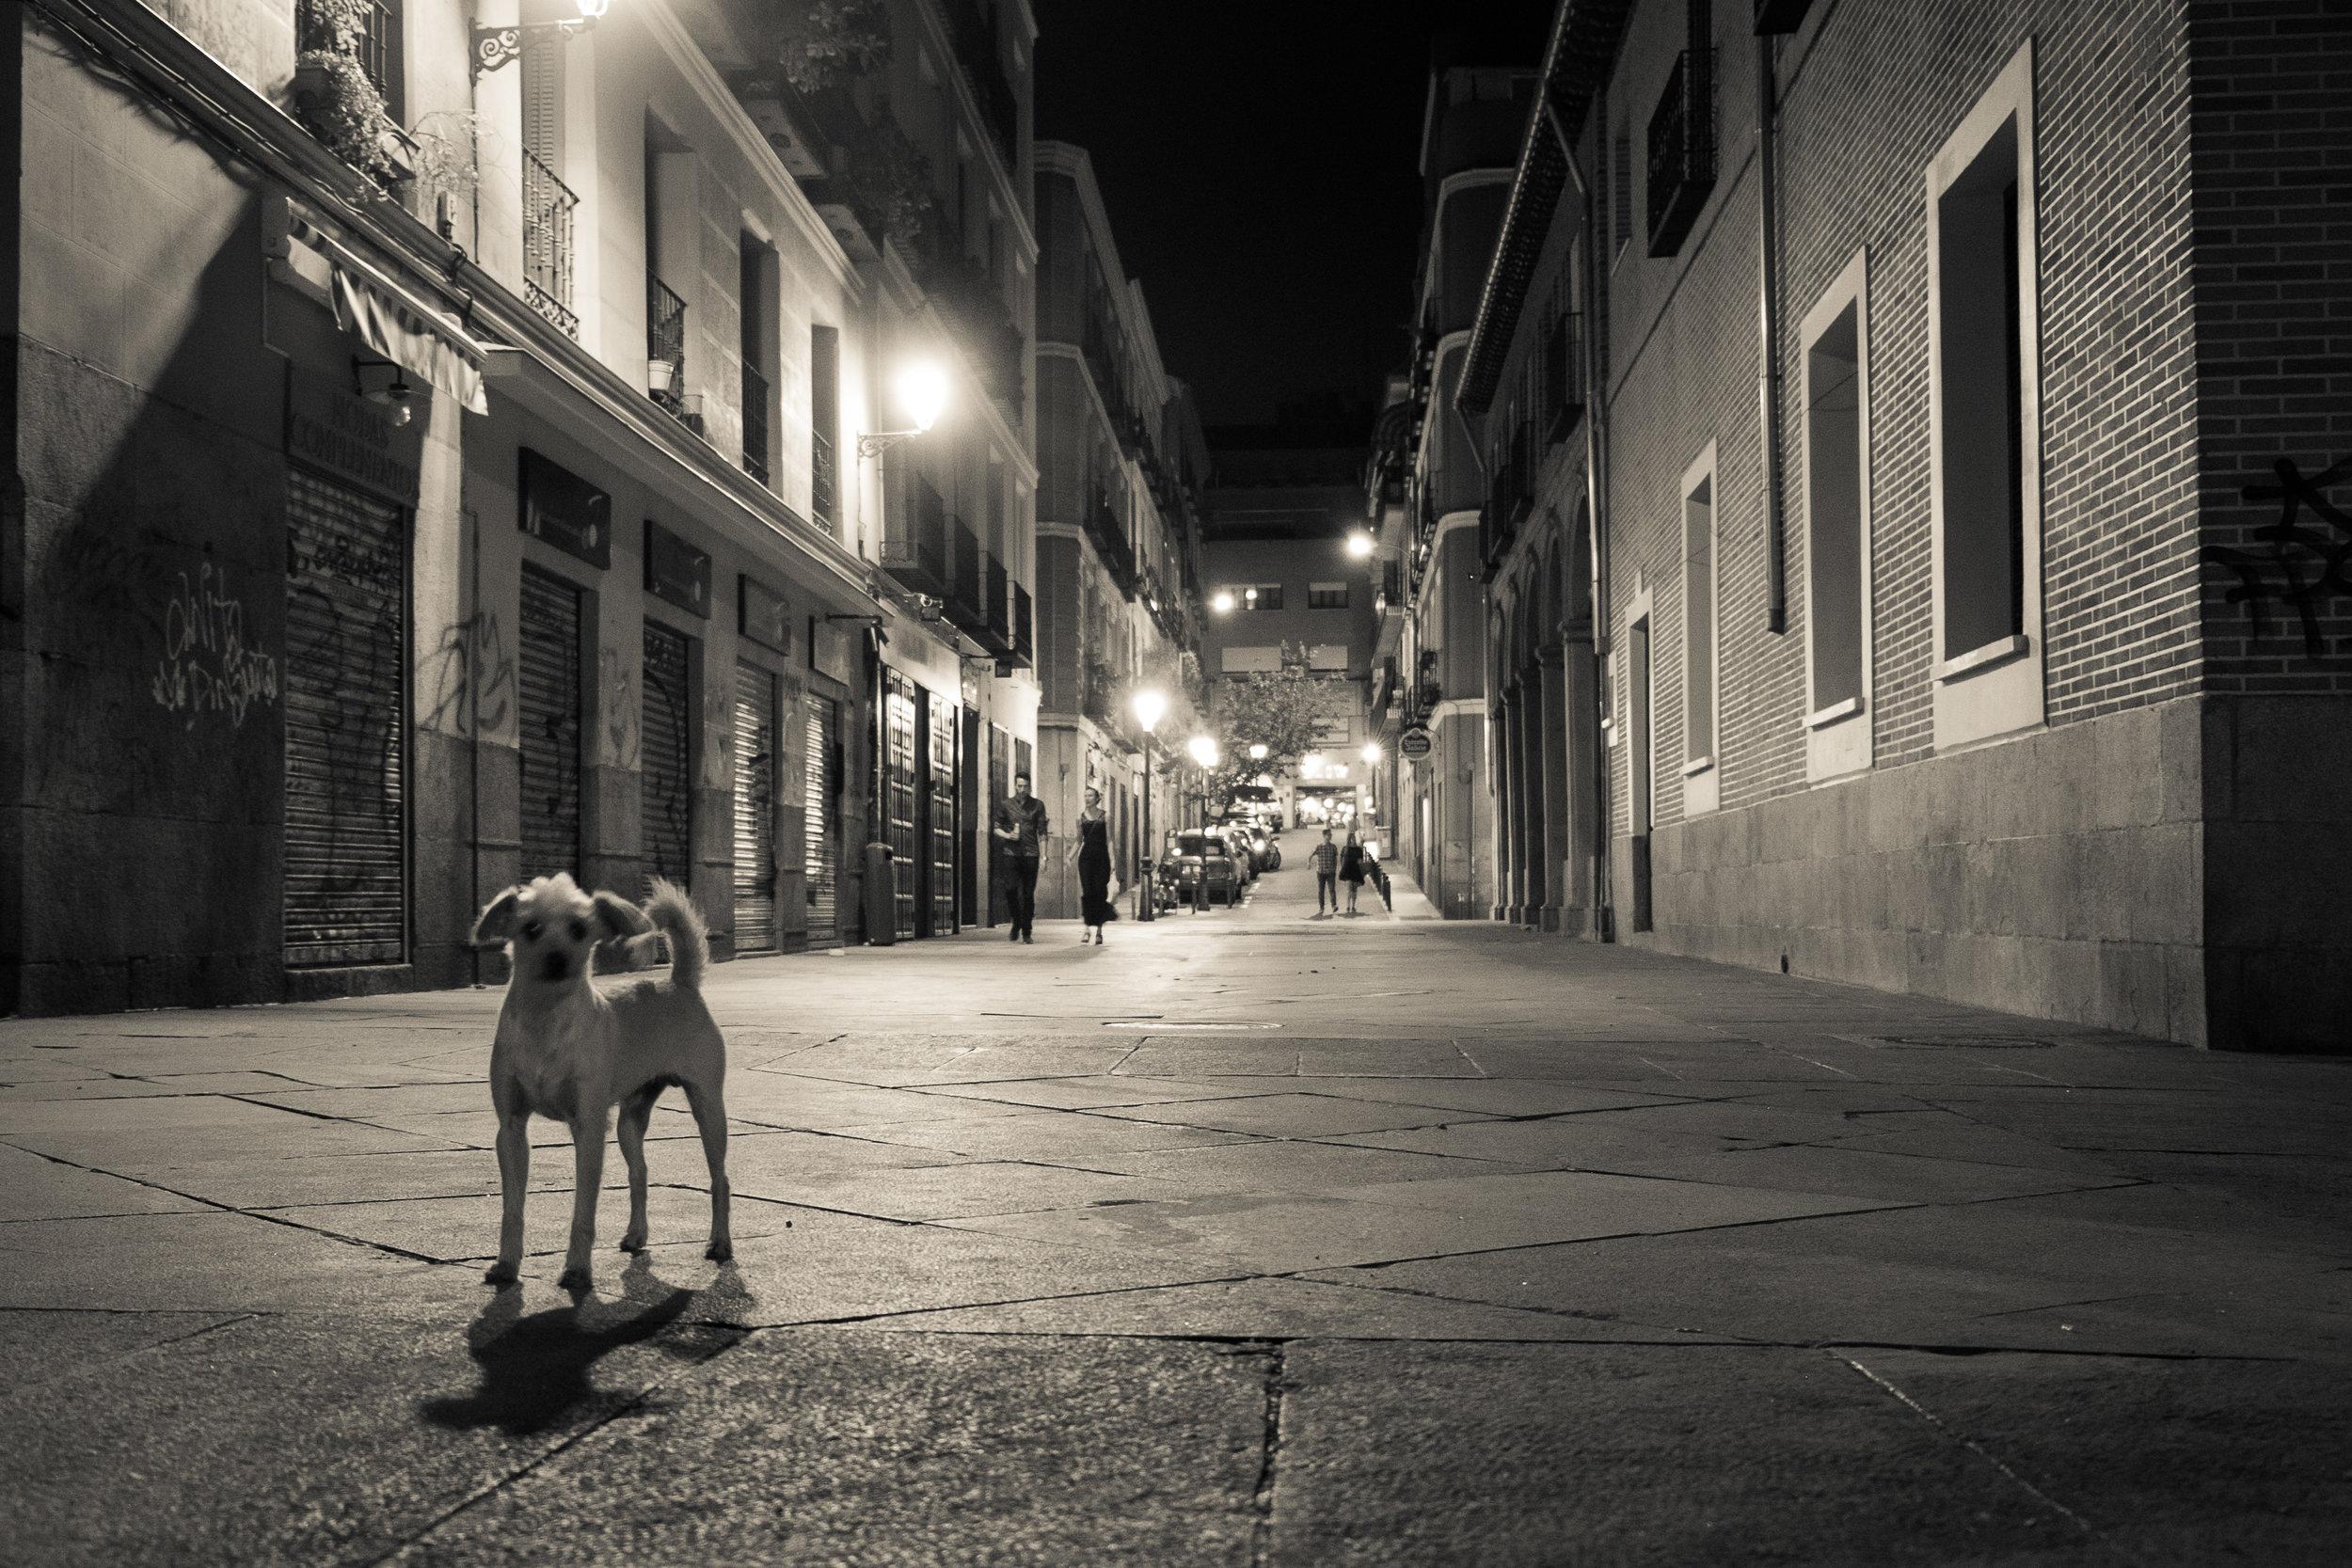 3_dogs-3.jpg